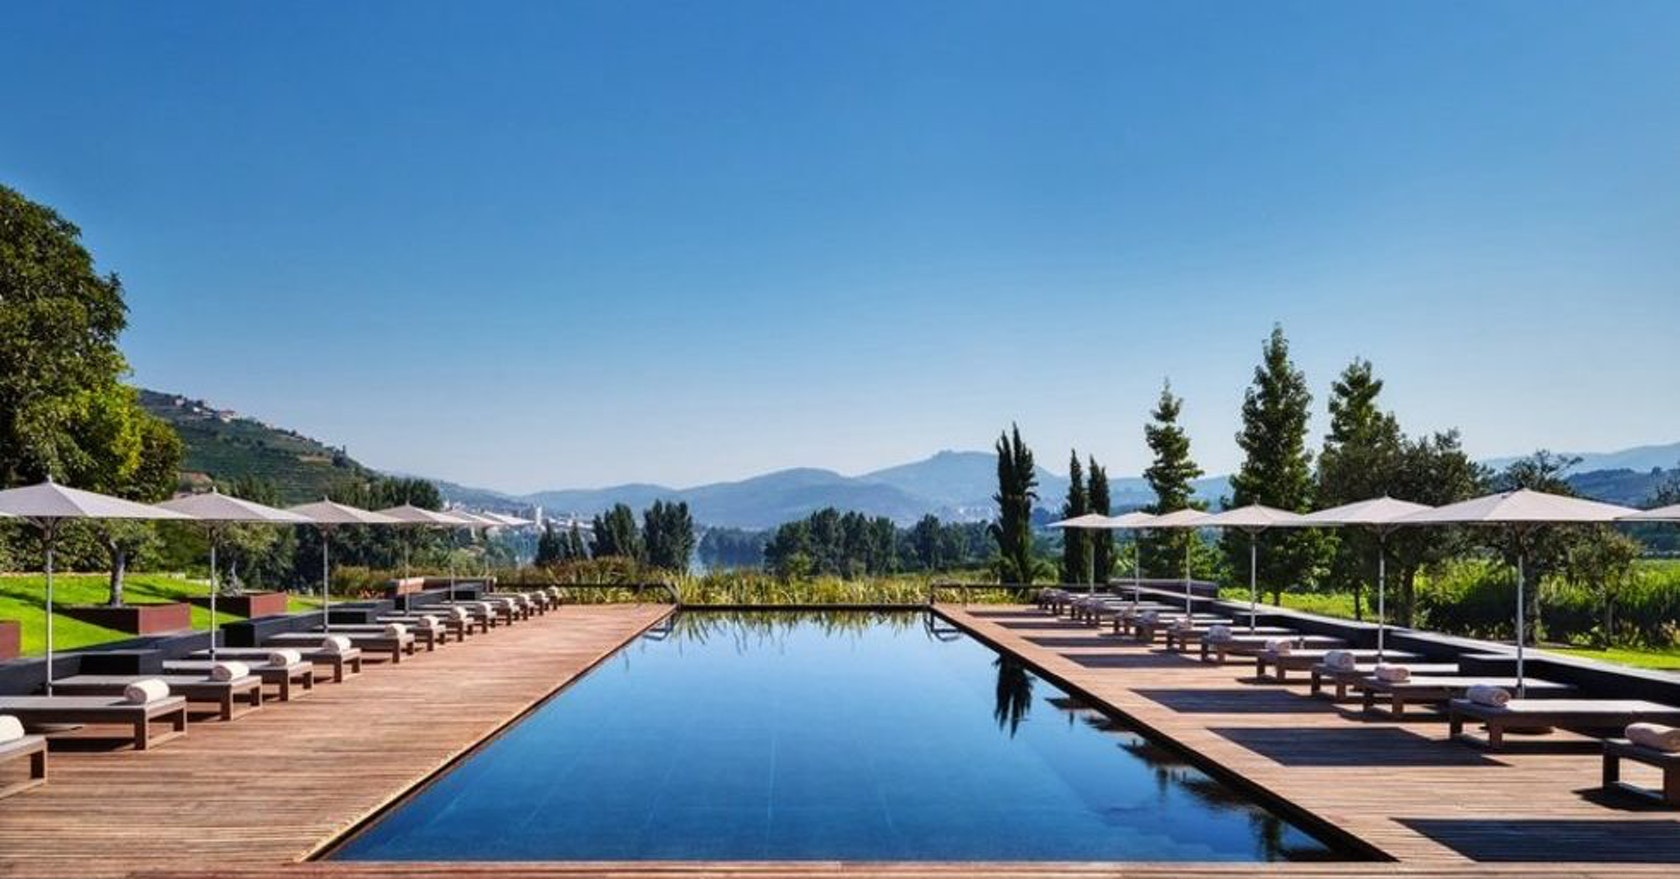 Explore Europe's unsung wine region in the Douro Valley